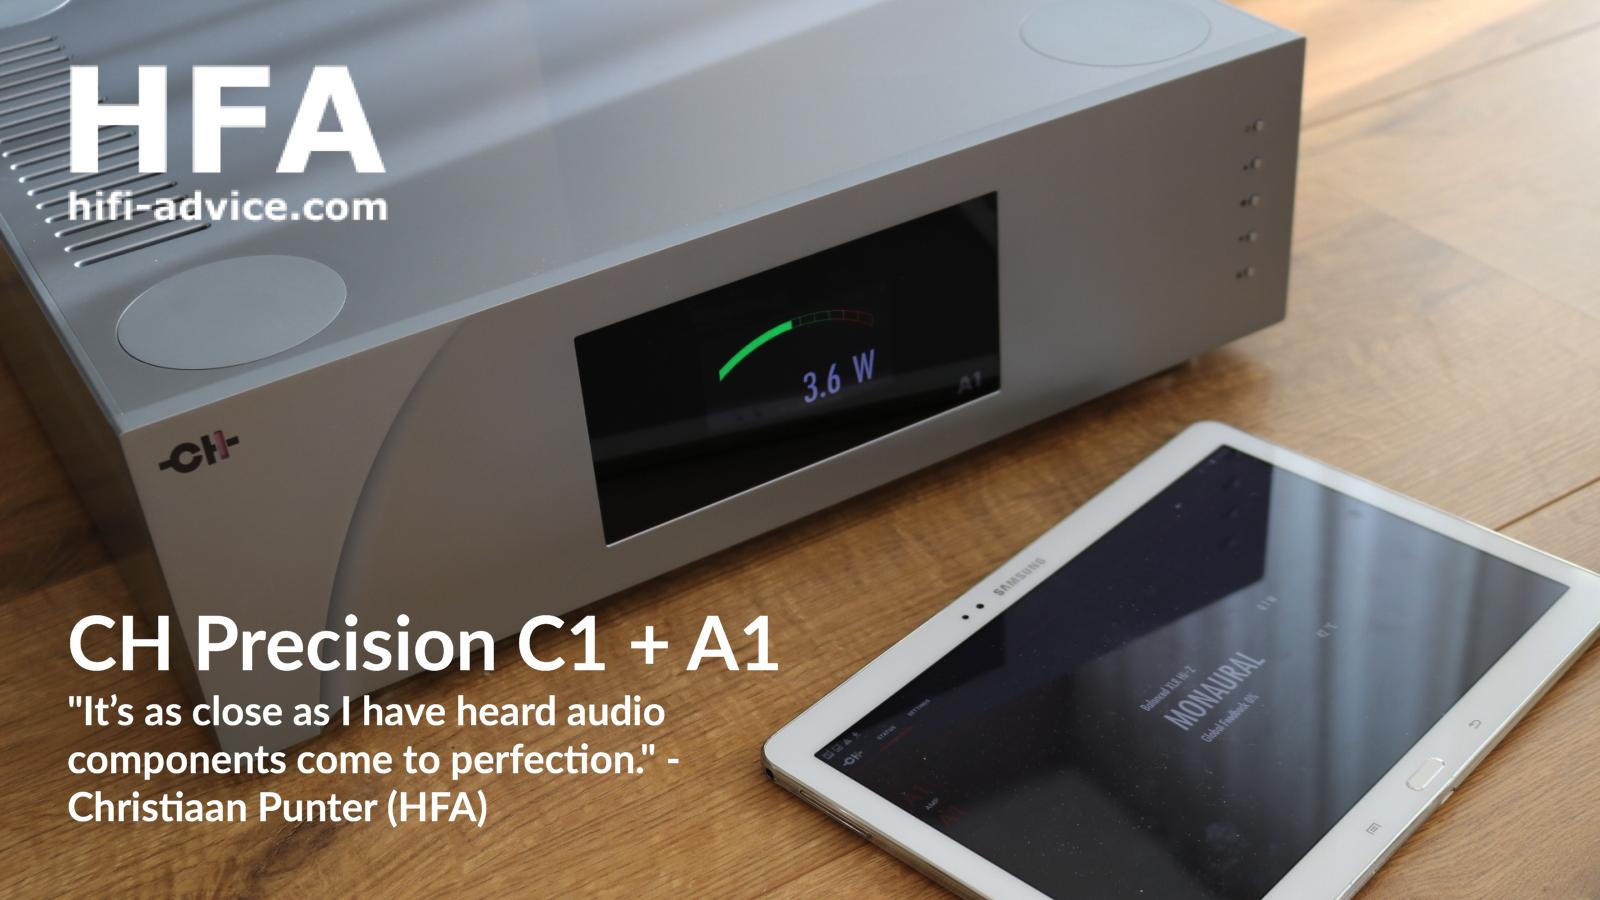 hfa-test-ch-precision-c1-a1